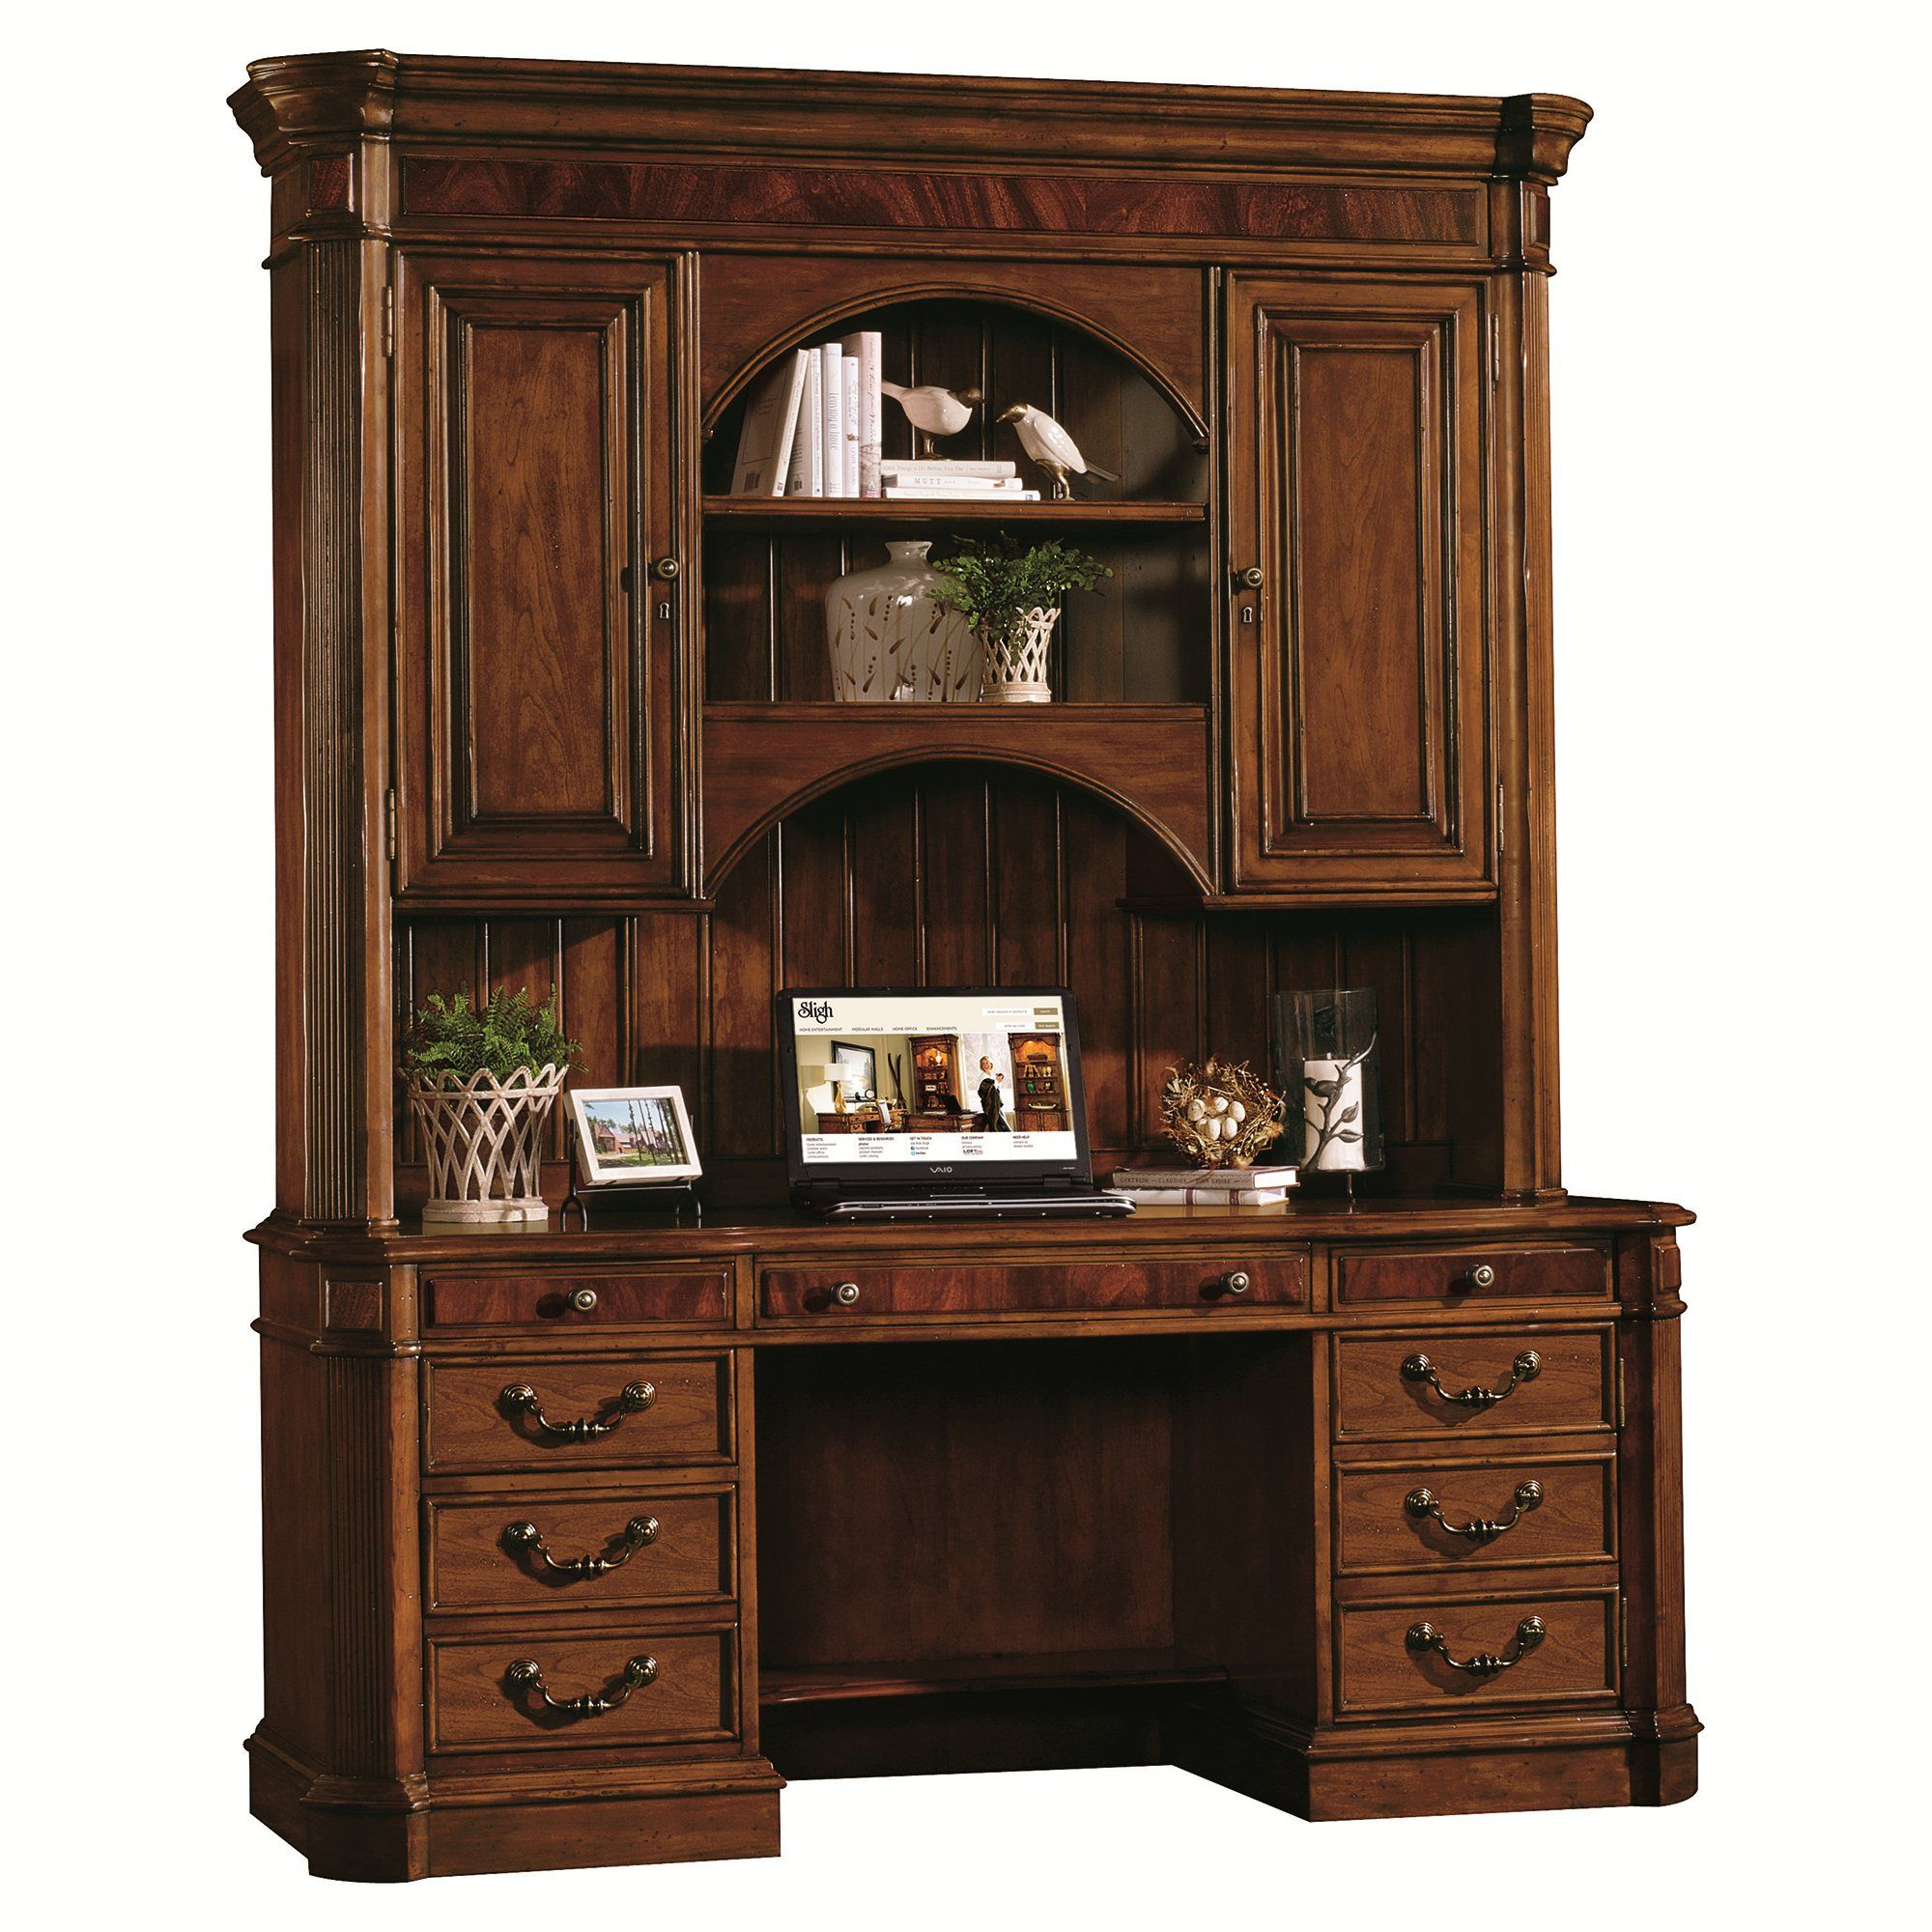 Sligh Home Office Credenza   Paul Schatz Furniture   Tigard, OR